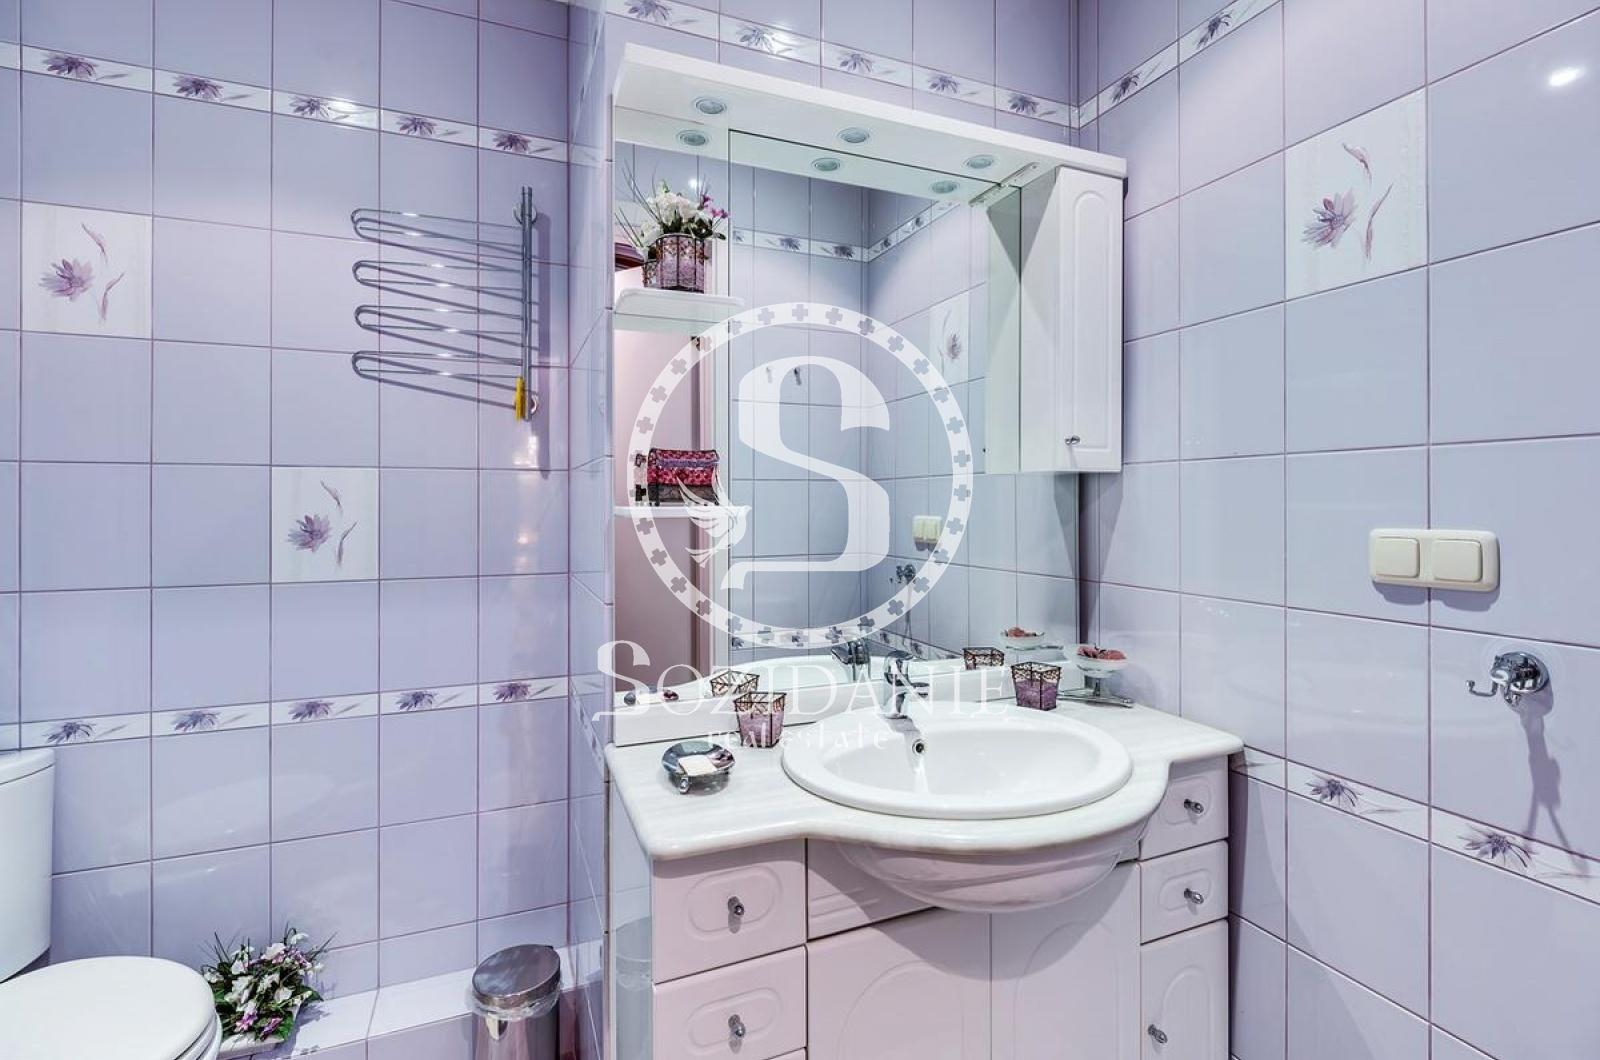 6 Комнаты, Городская, Продажа, Улица 1-я Тверская-Ямская, Listing ID 3472, Москва, Россия,